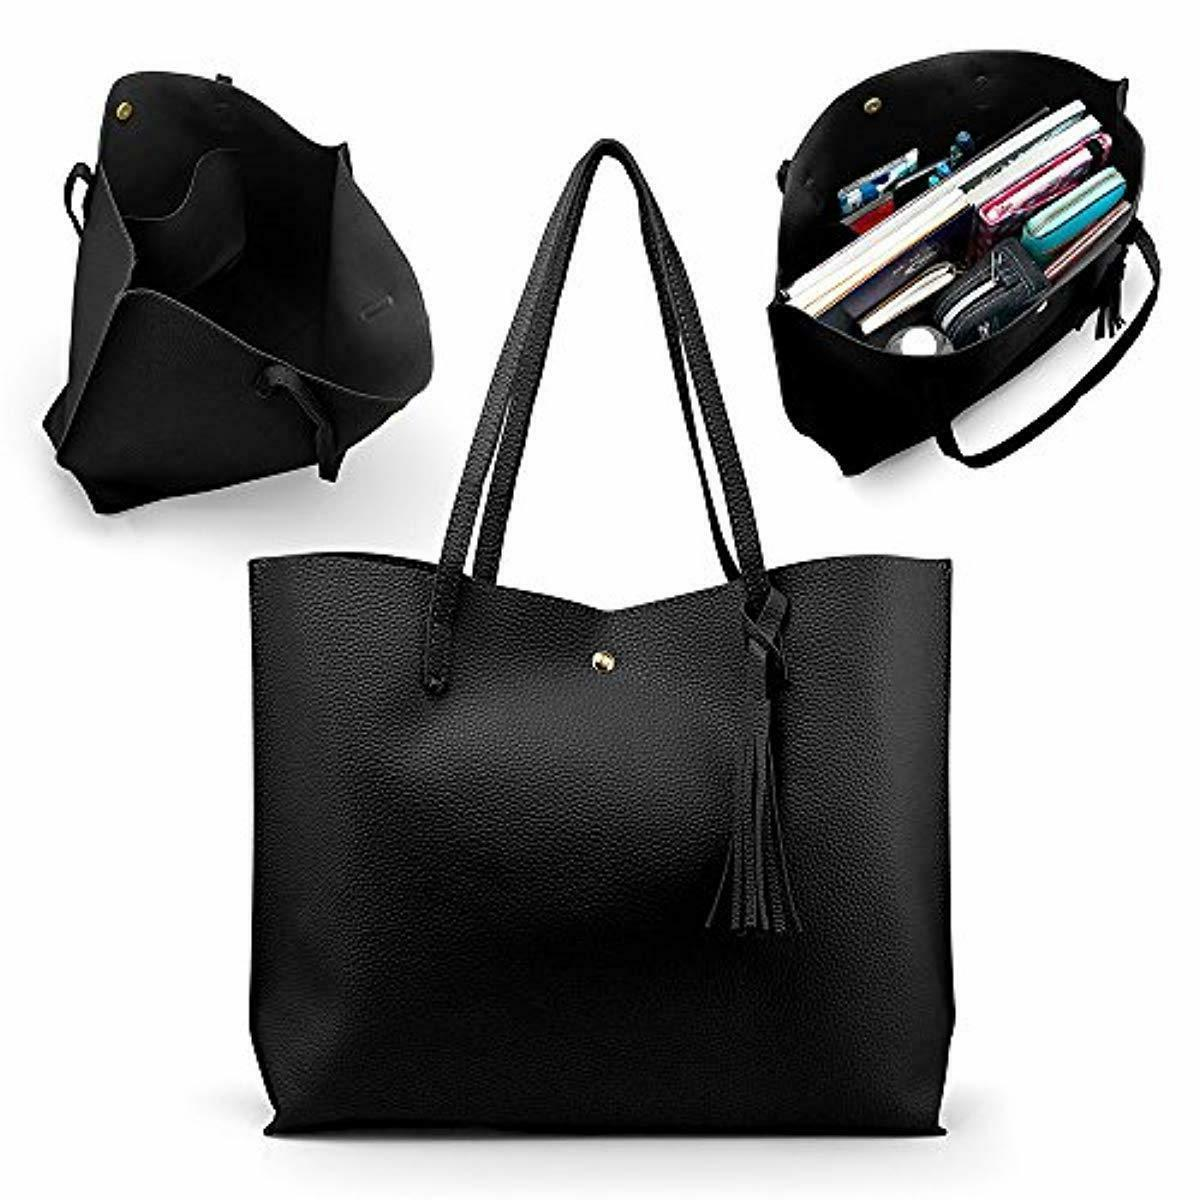 Womens Faux Leather Fashion Messenger Handbag Lady Shoulder